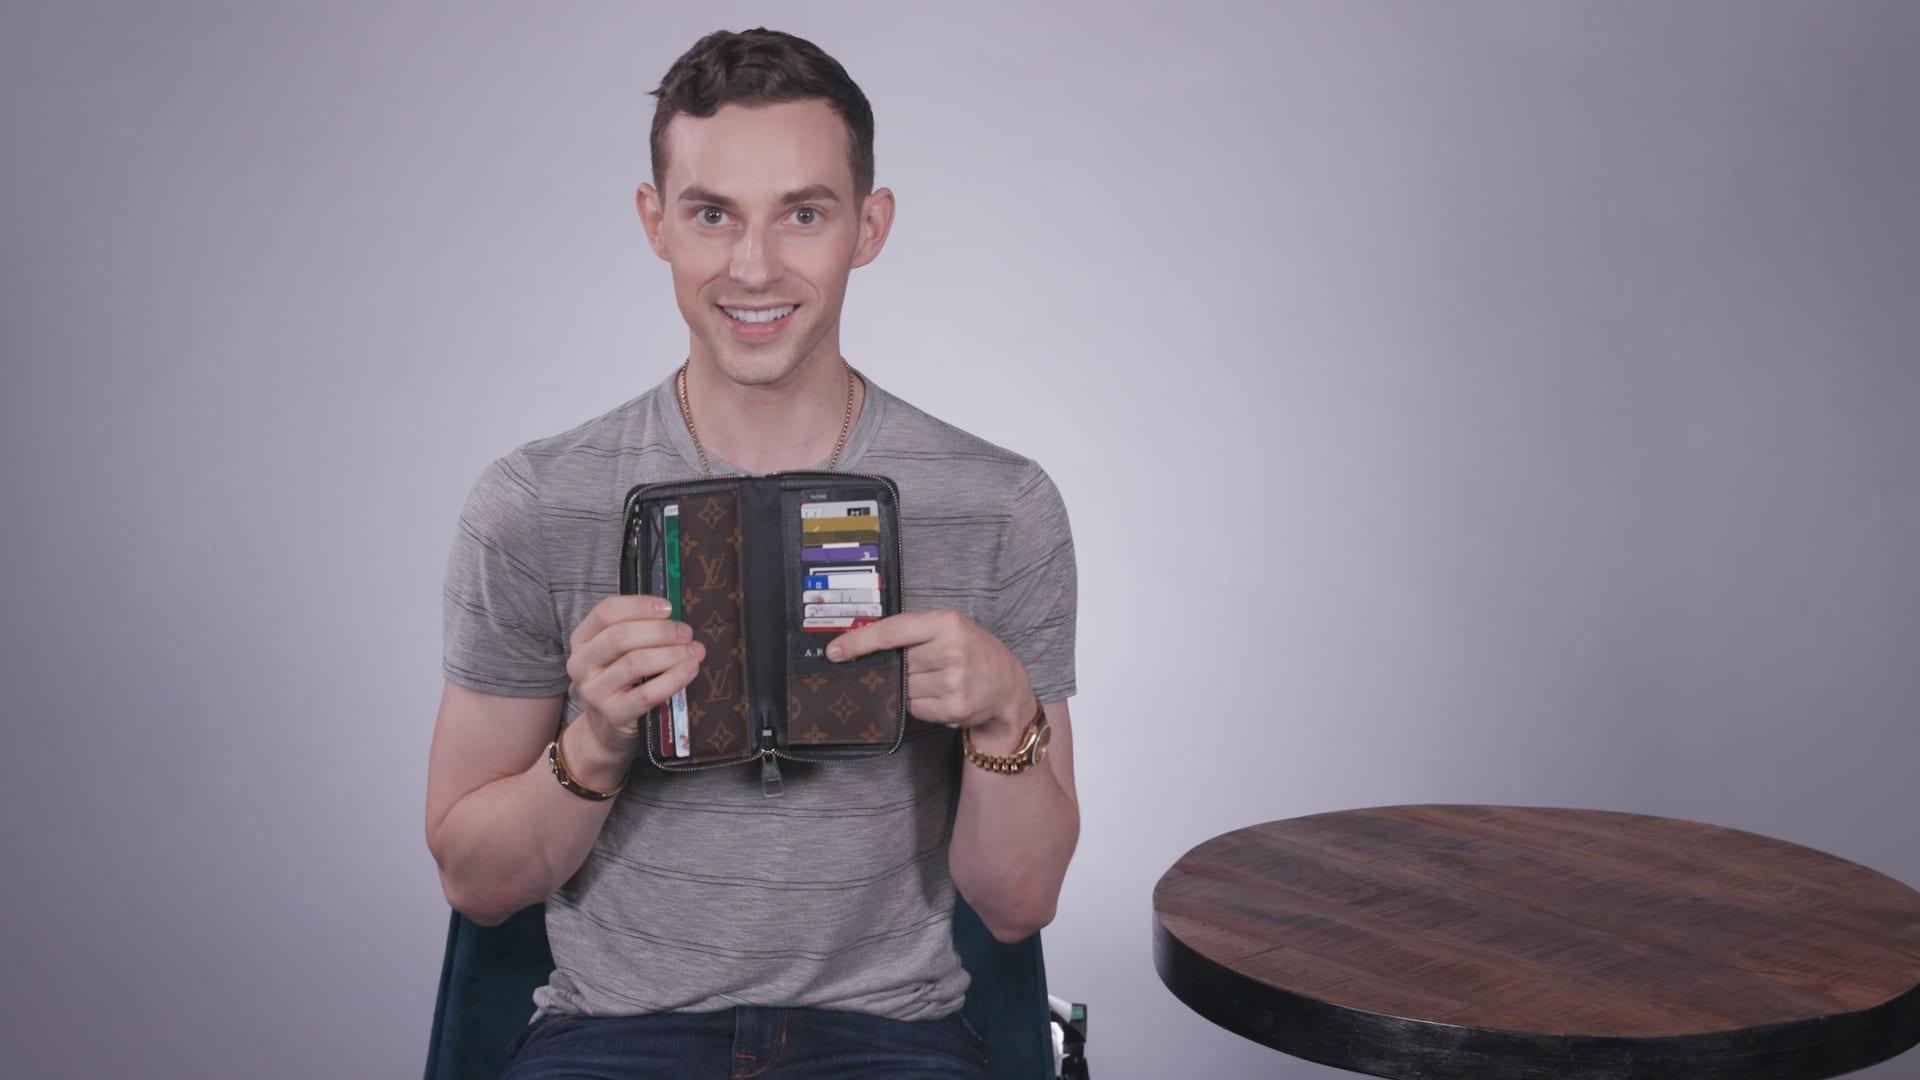 A look inside Olympic medalist Adam Rippon's designer wallet